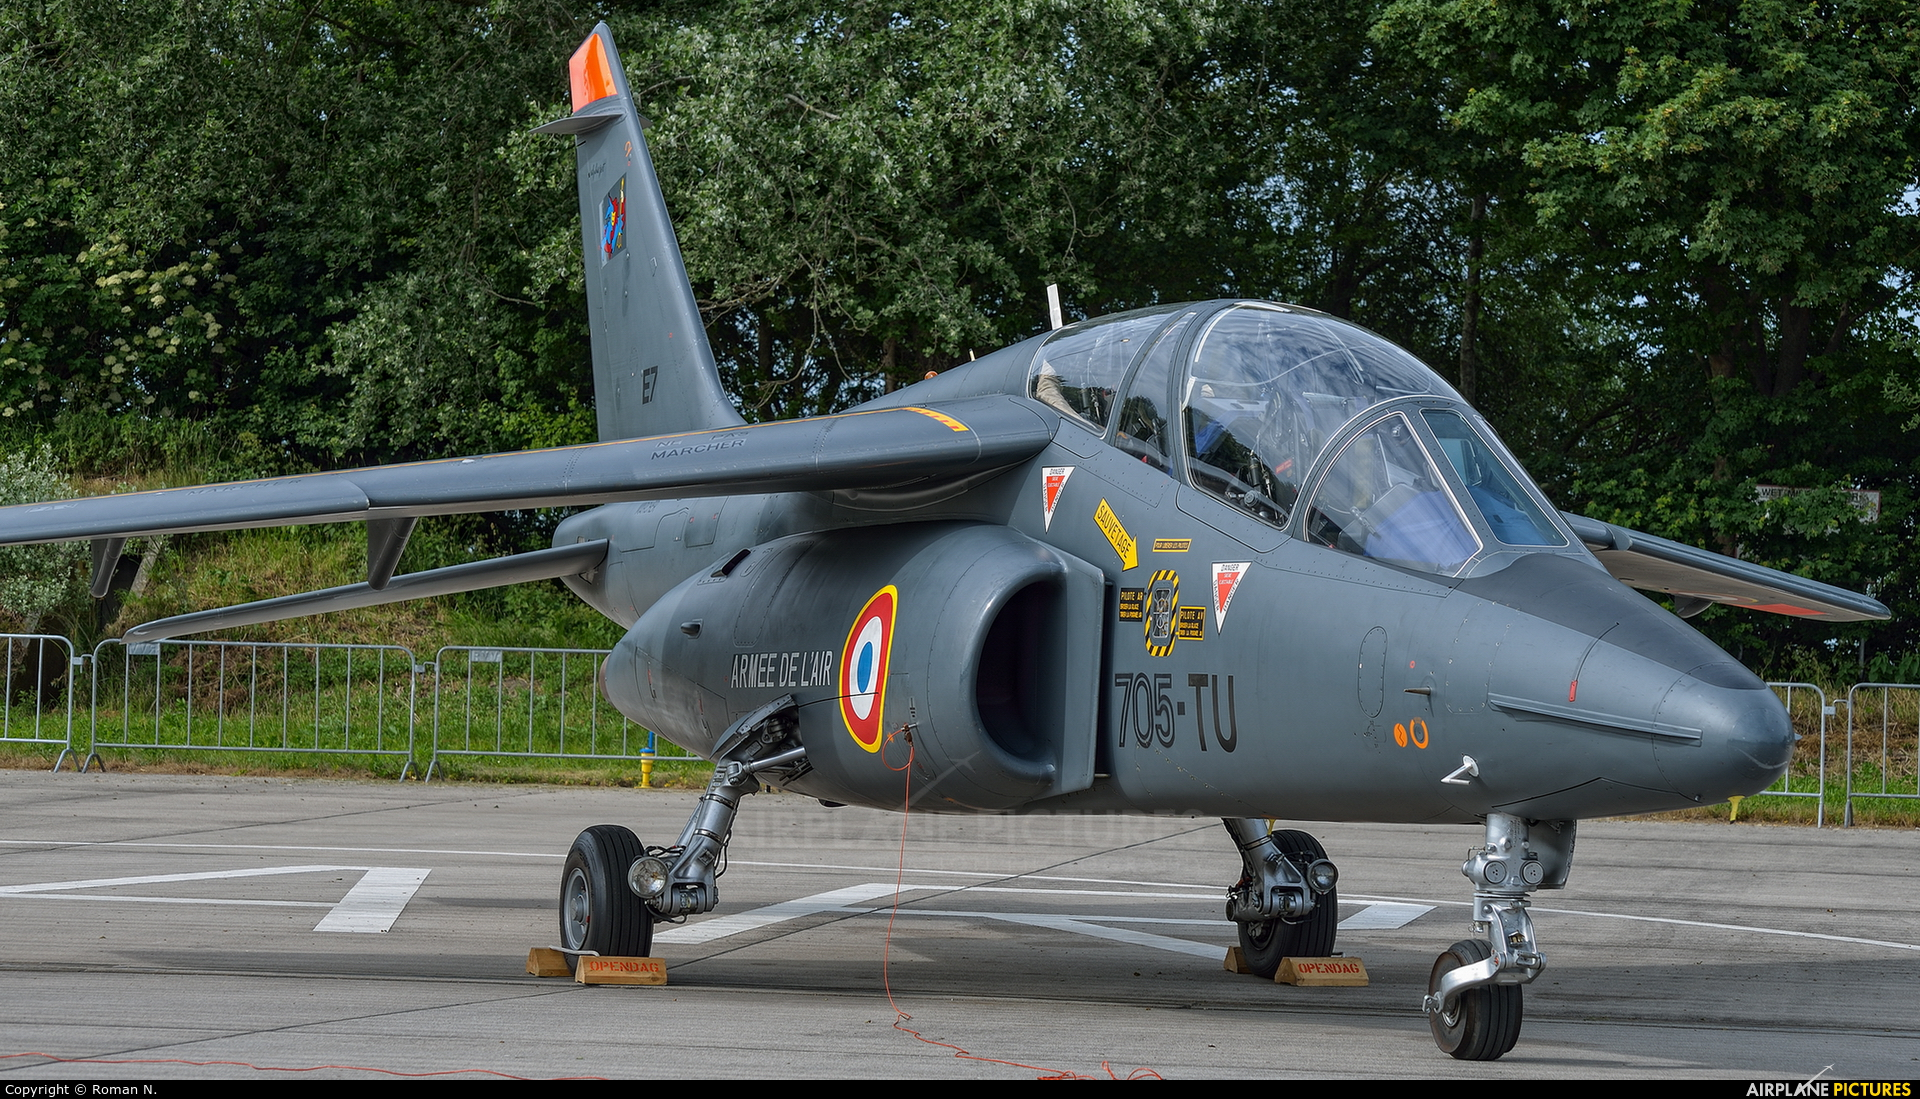 France - Air Force E7 aircraft at Leeuwarden